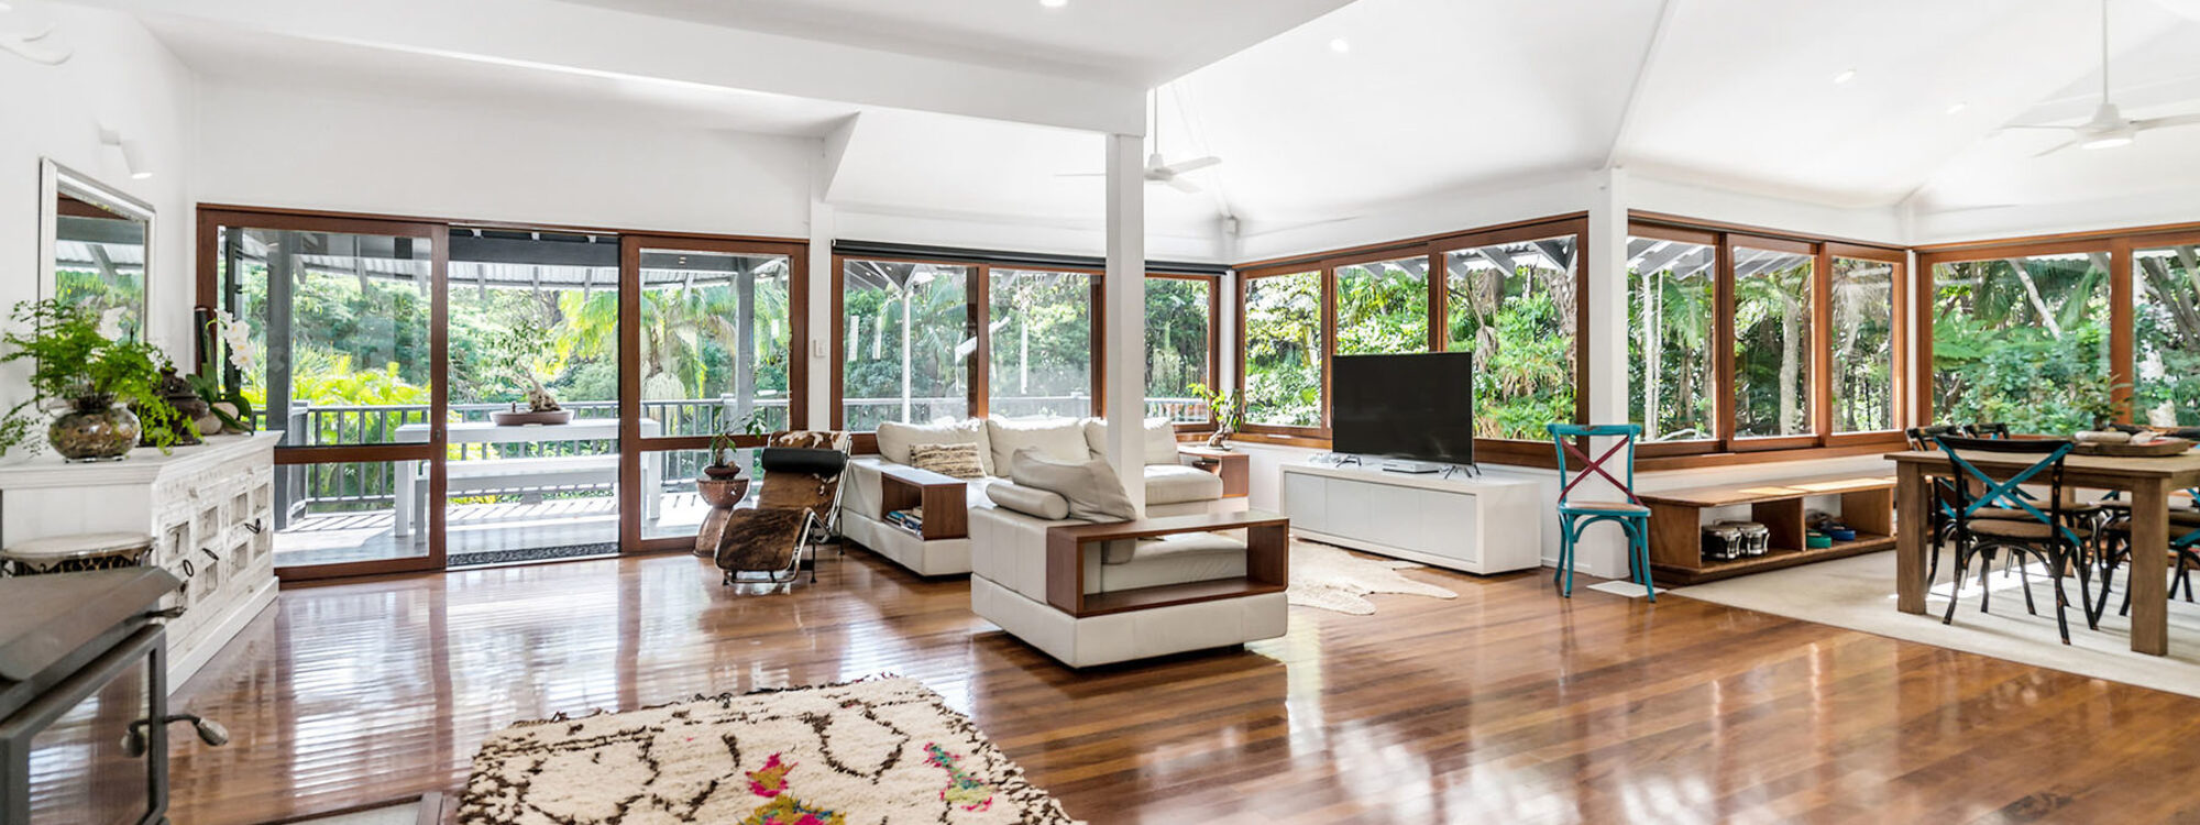 Ourmuli - Byron Bay - Fireplace Lounge and Dining